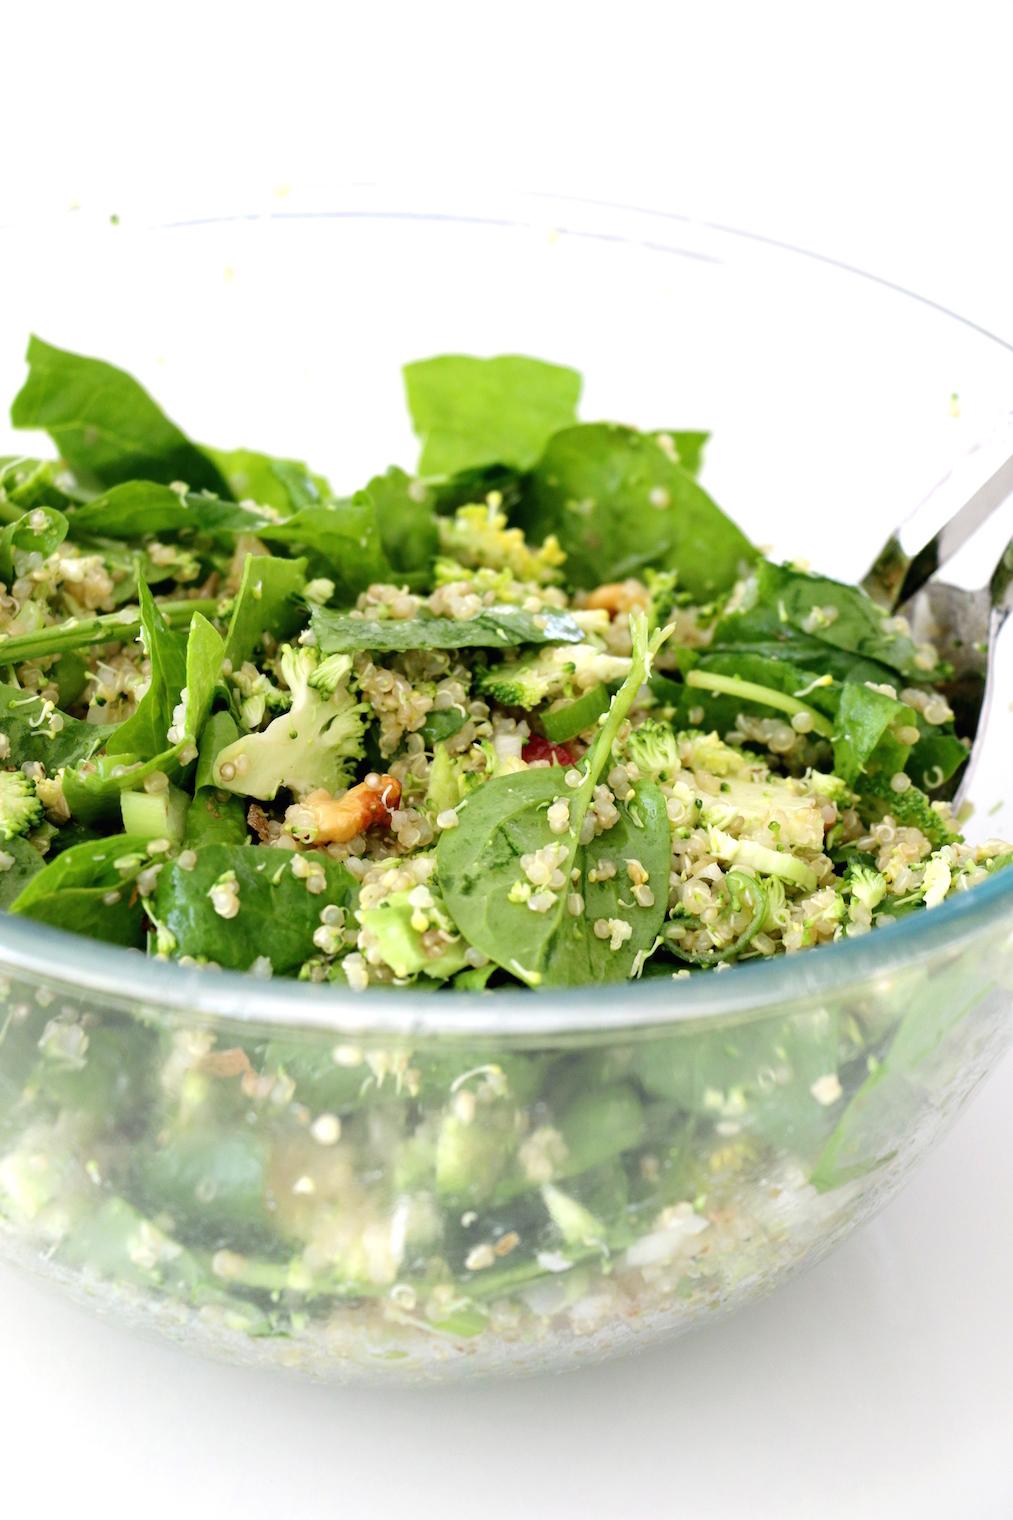 shredded-broccoli-and-spinach-quinoa-salad2